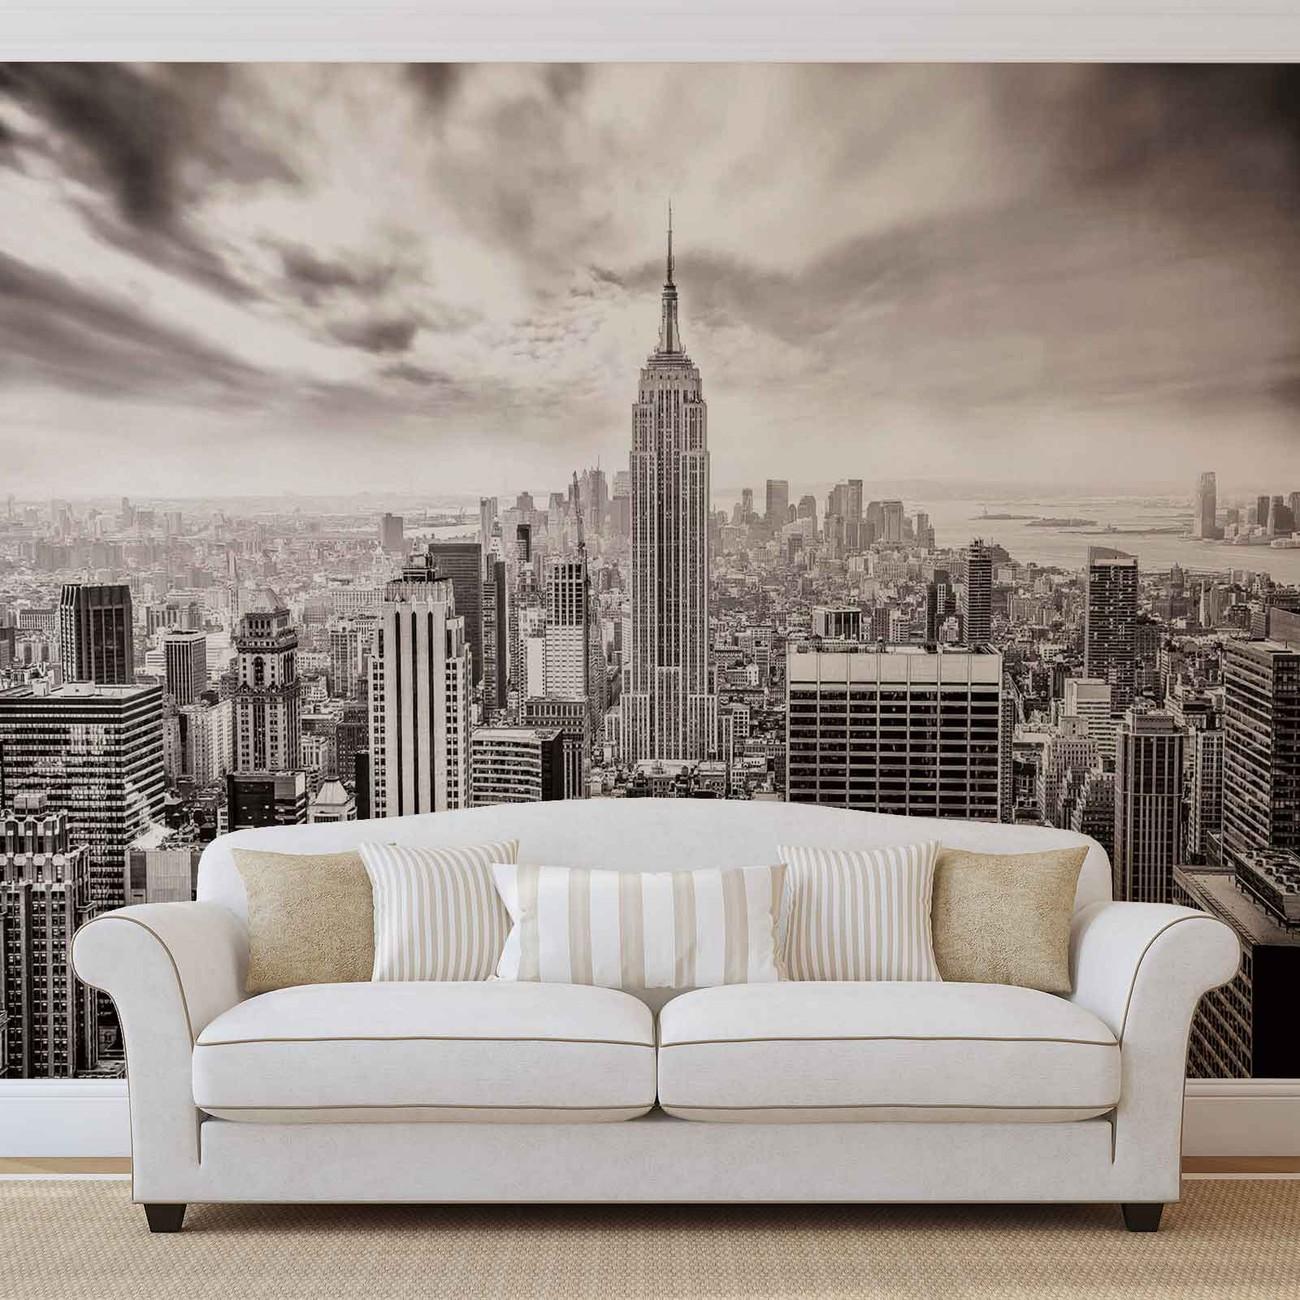 Fotomurale ciudad skyline empire state nueva york papel - Papel pintado nueva york ...